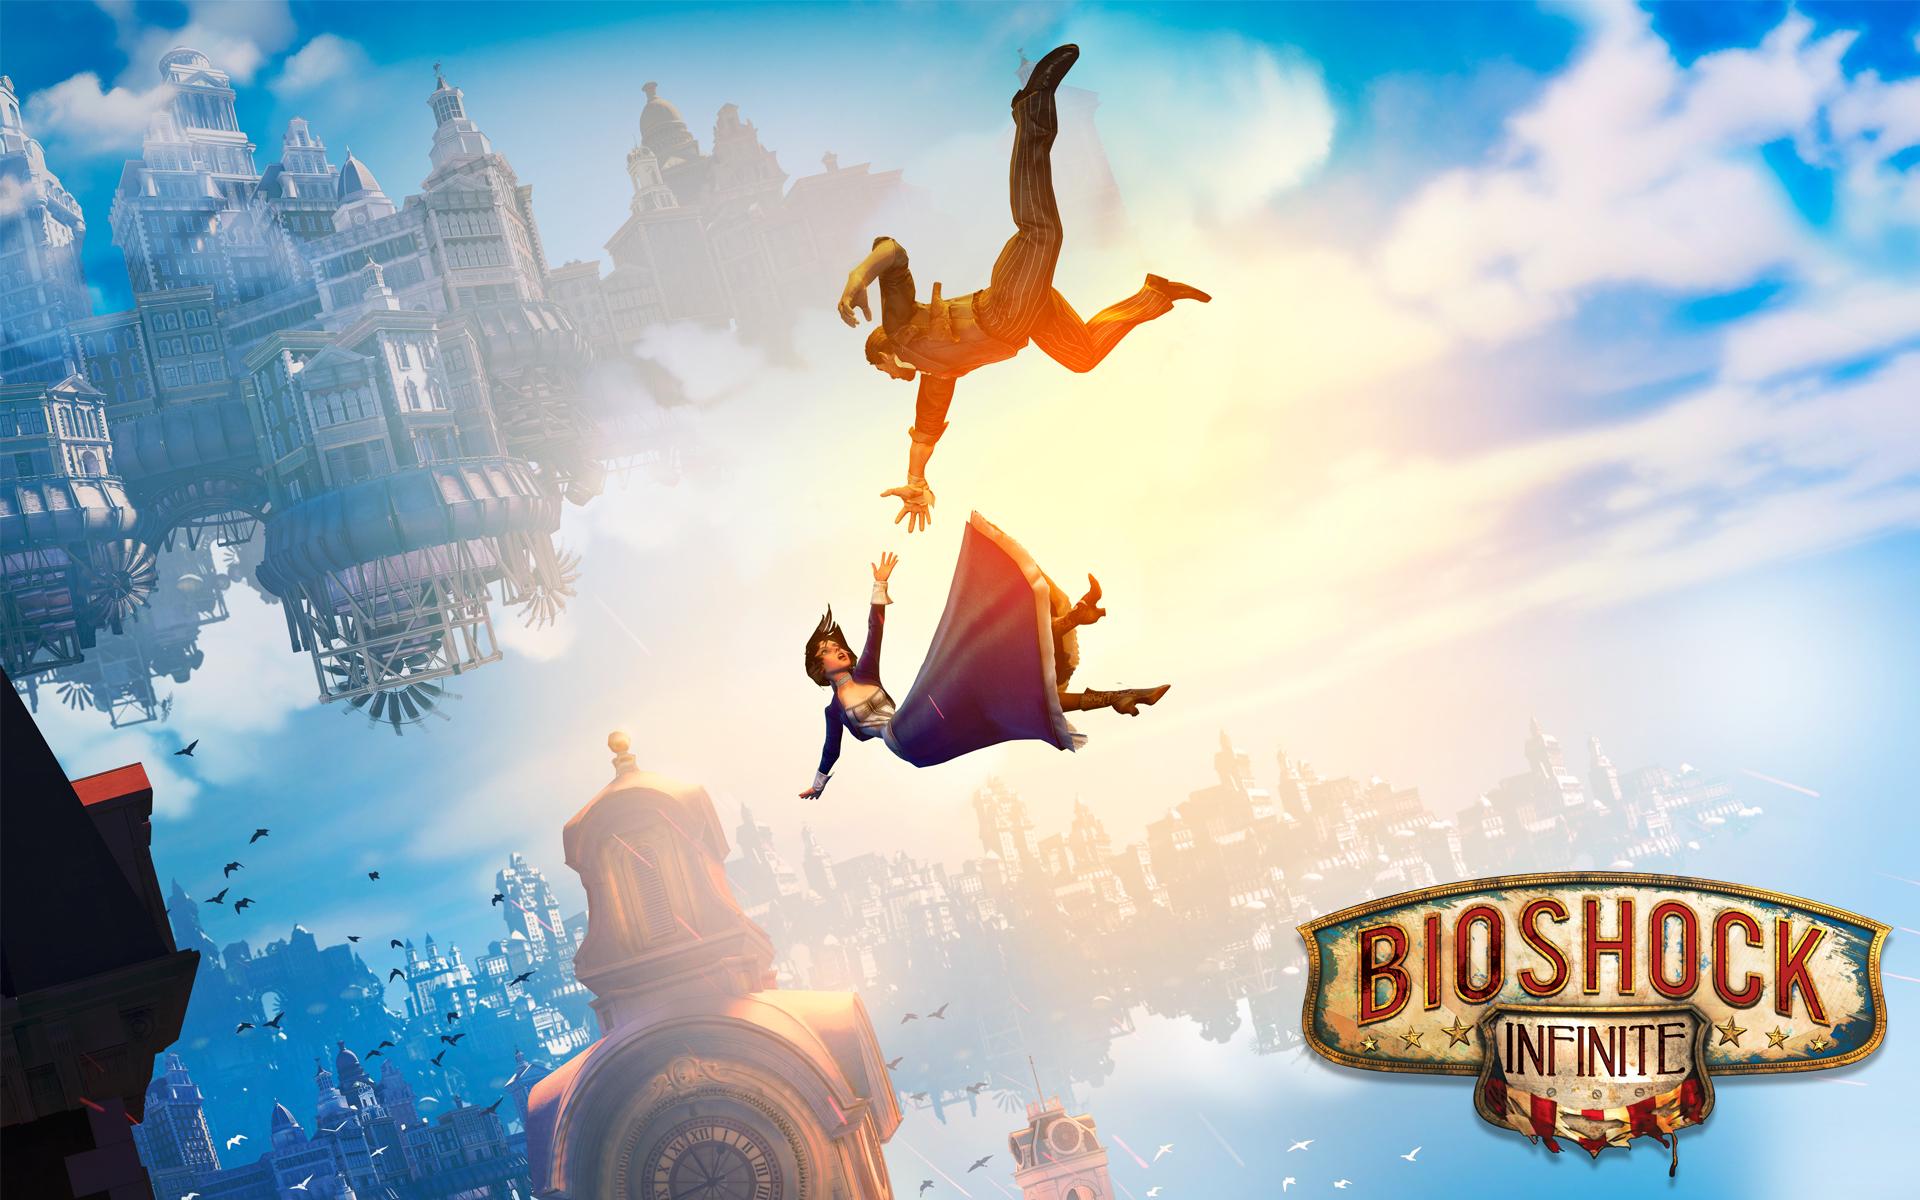 Bioshock-Infinite-Booker-and-Elizabeth-Wallpaper-0